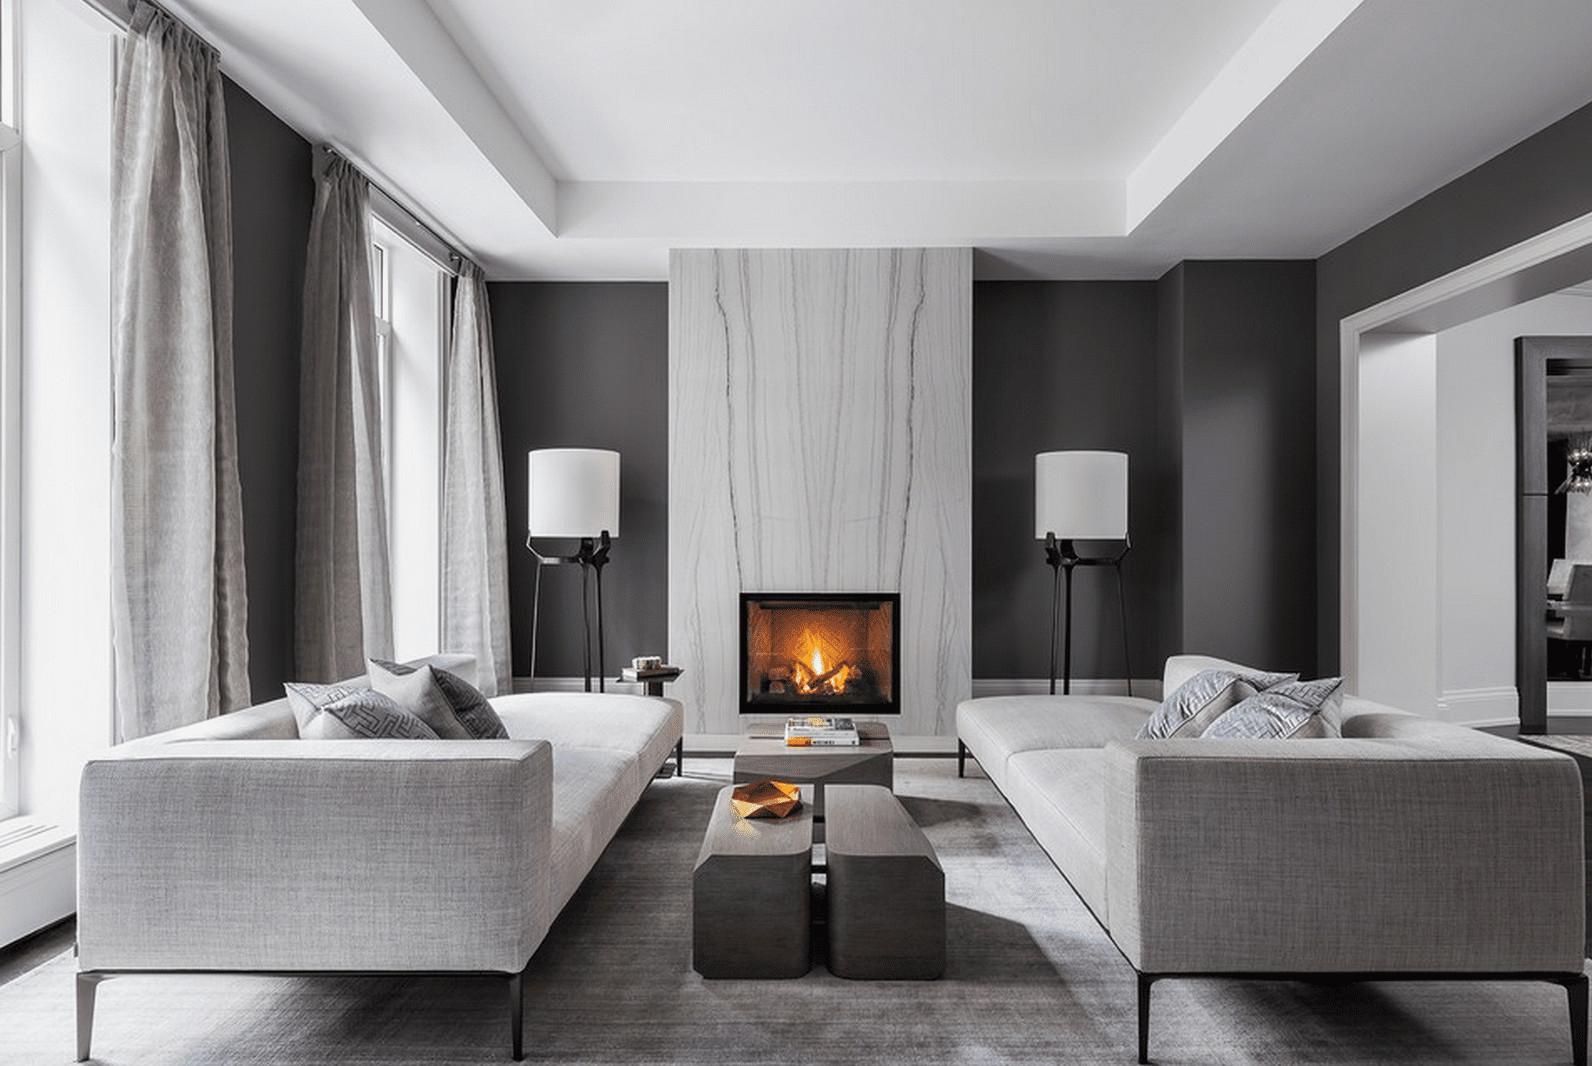 Modern Living Room Decor Ideas 21 Modern Living Room Design Ideas